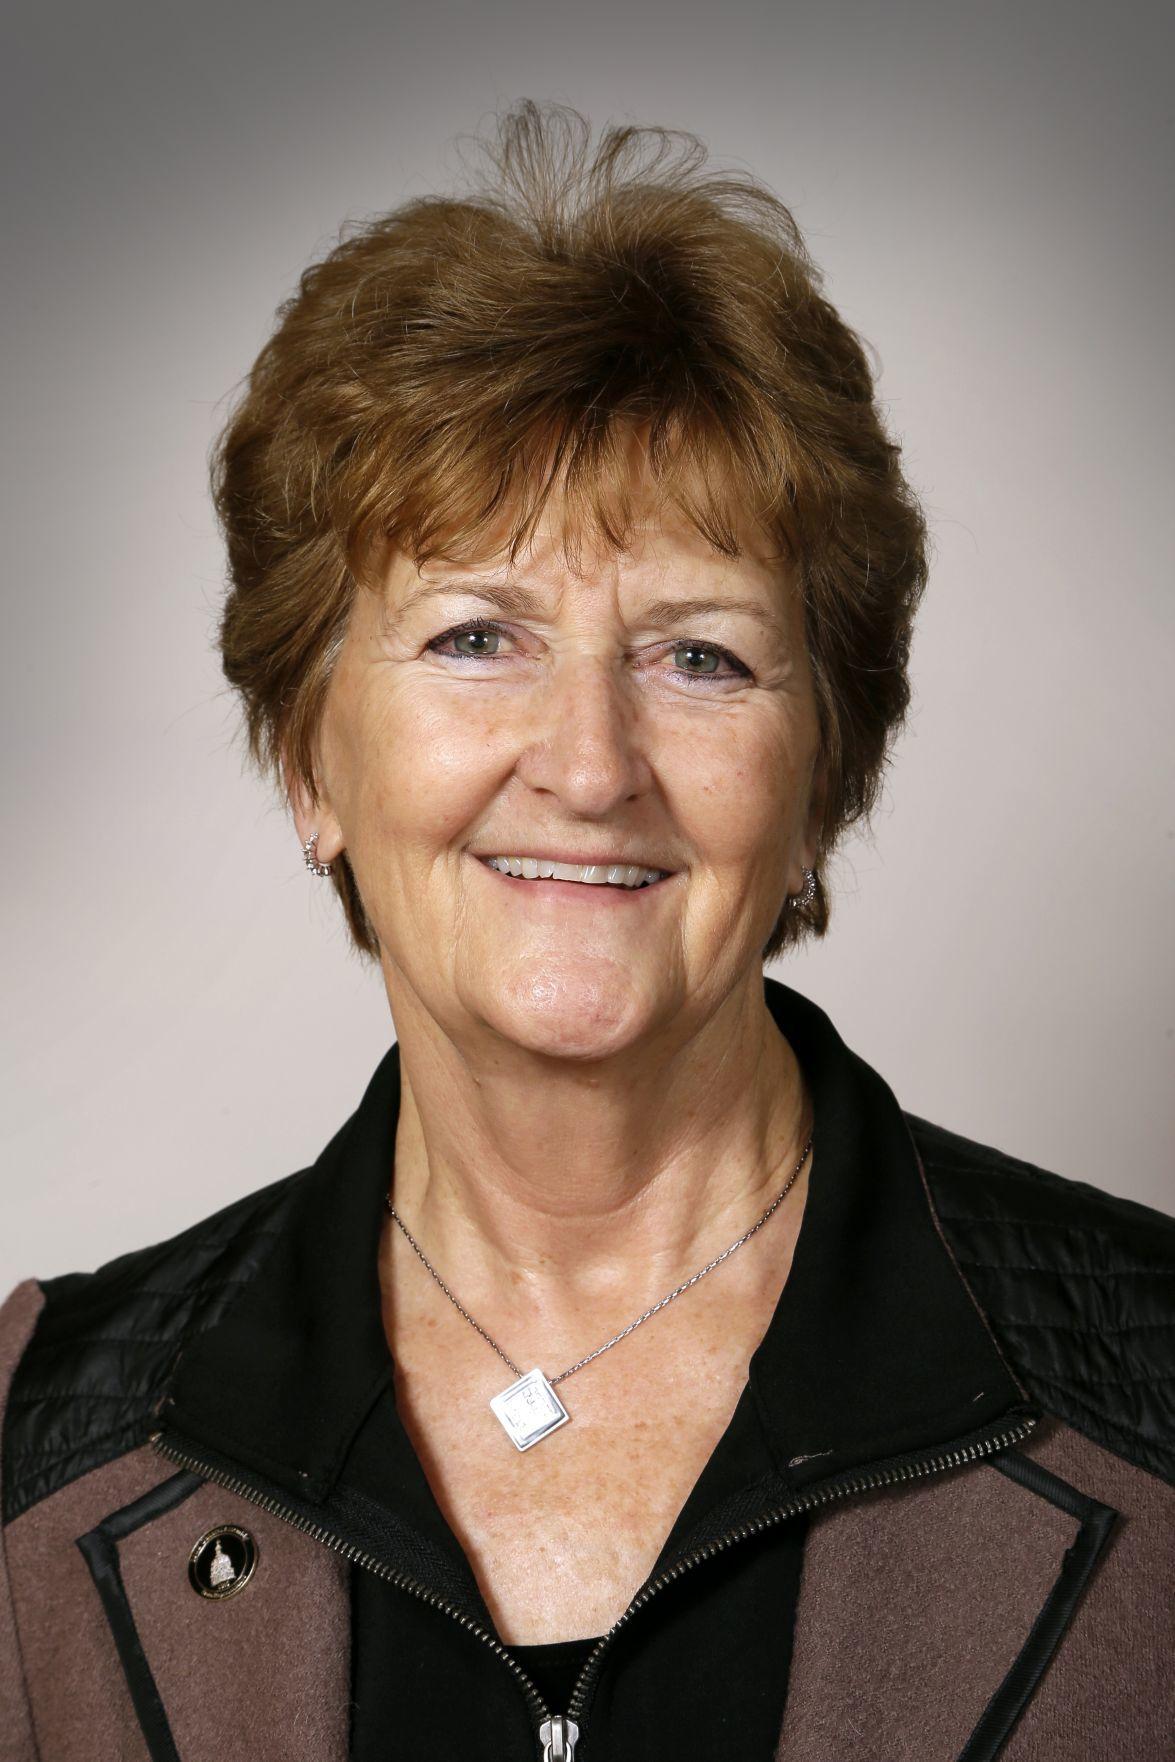 Representative Sharon S. Steckman